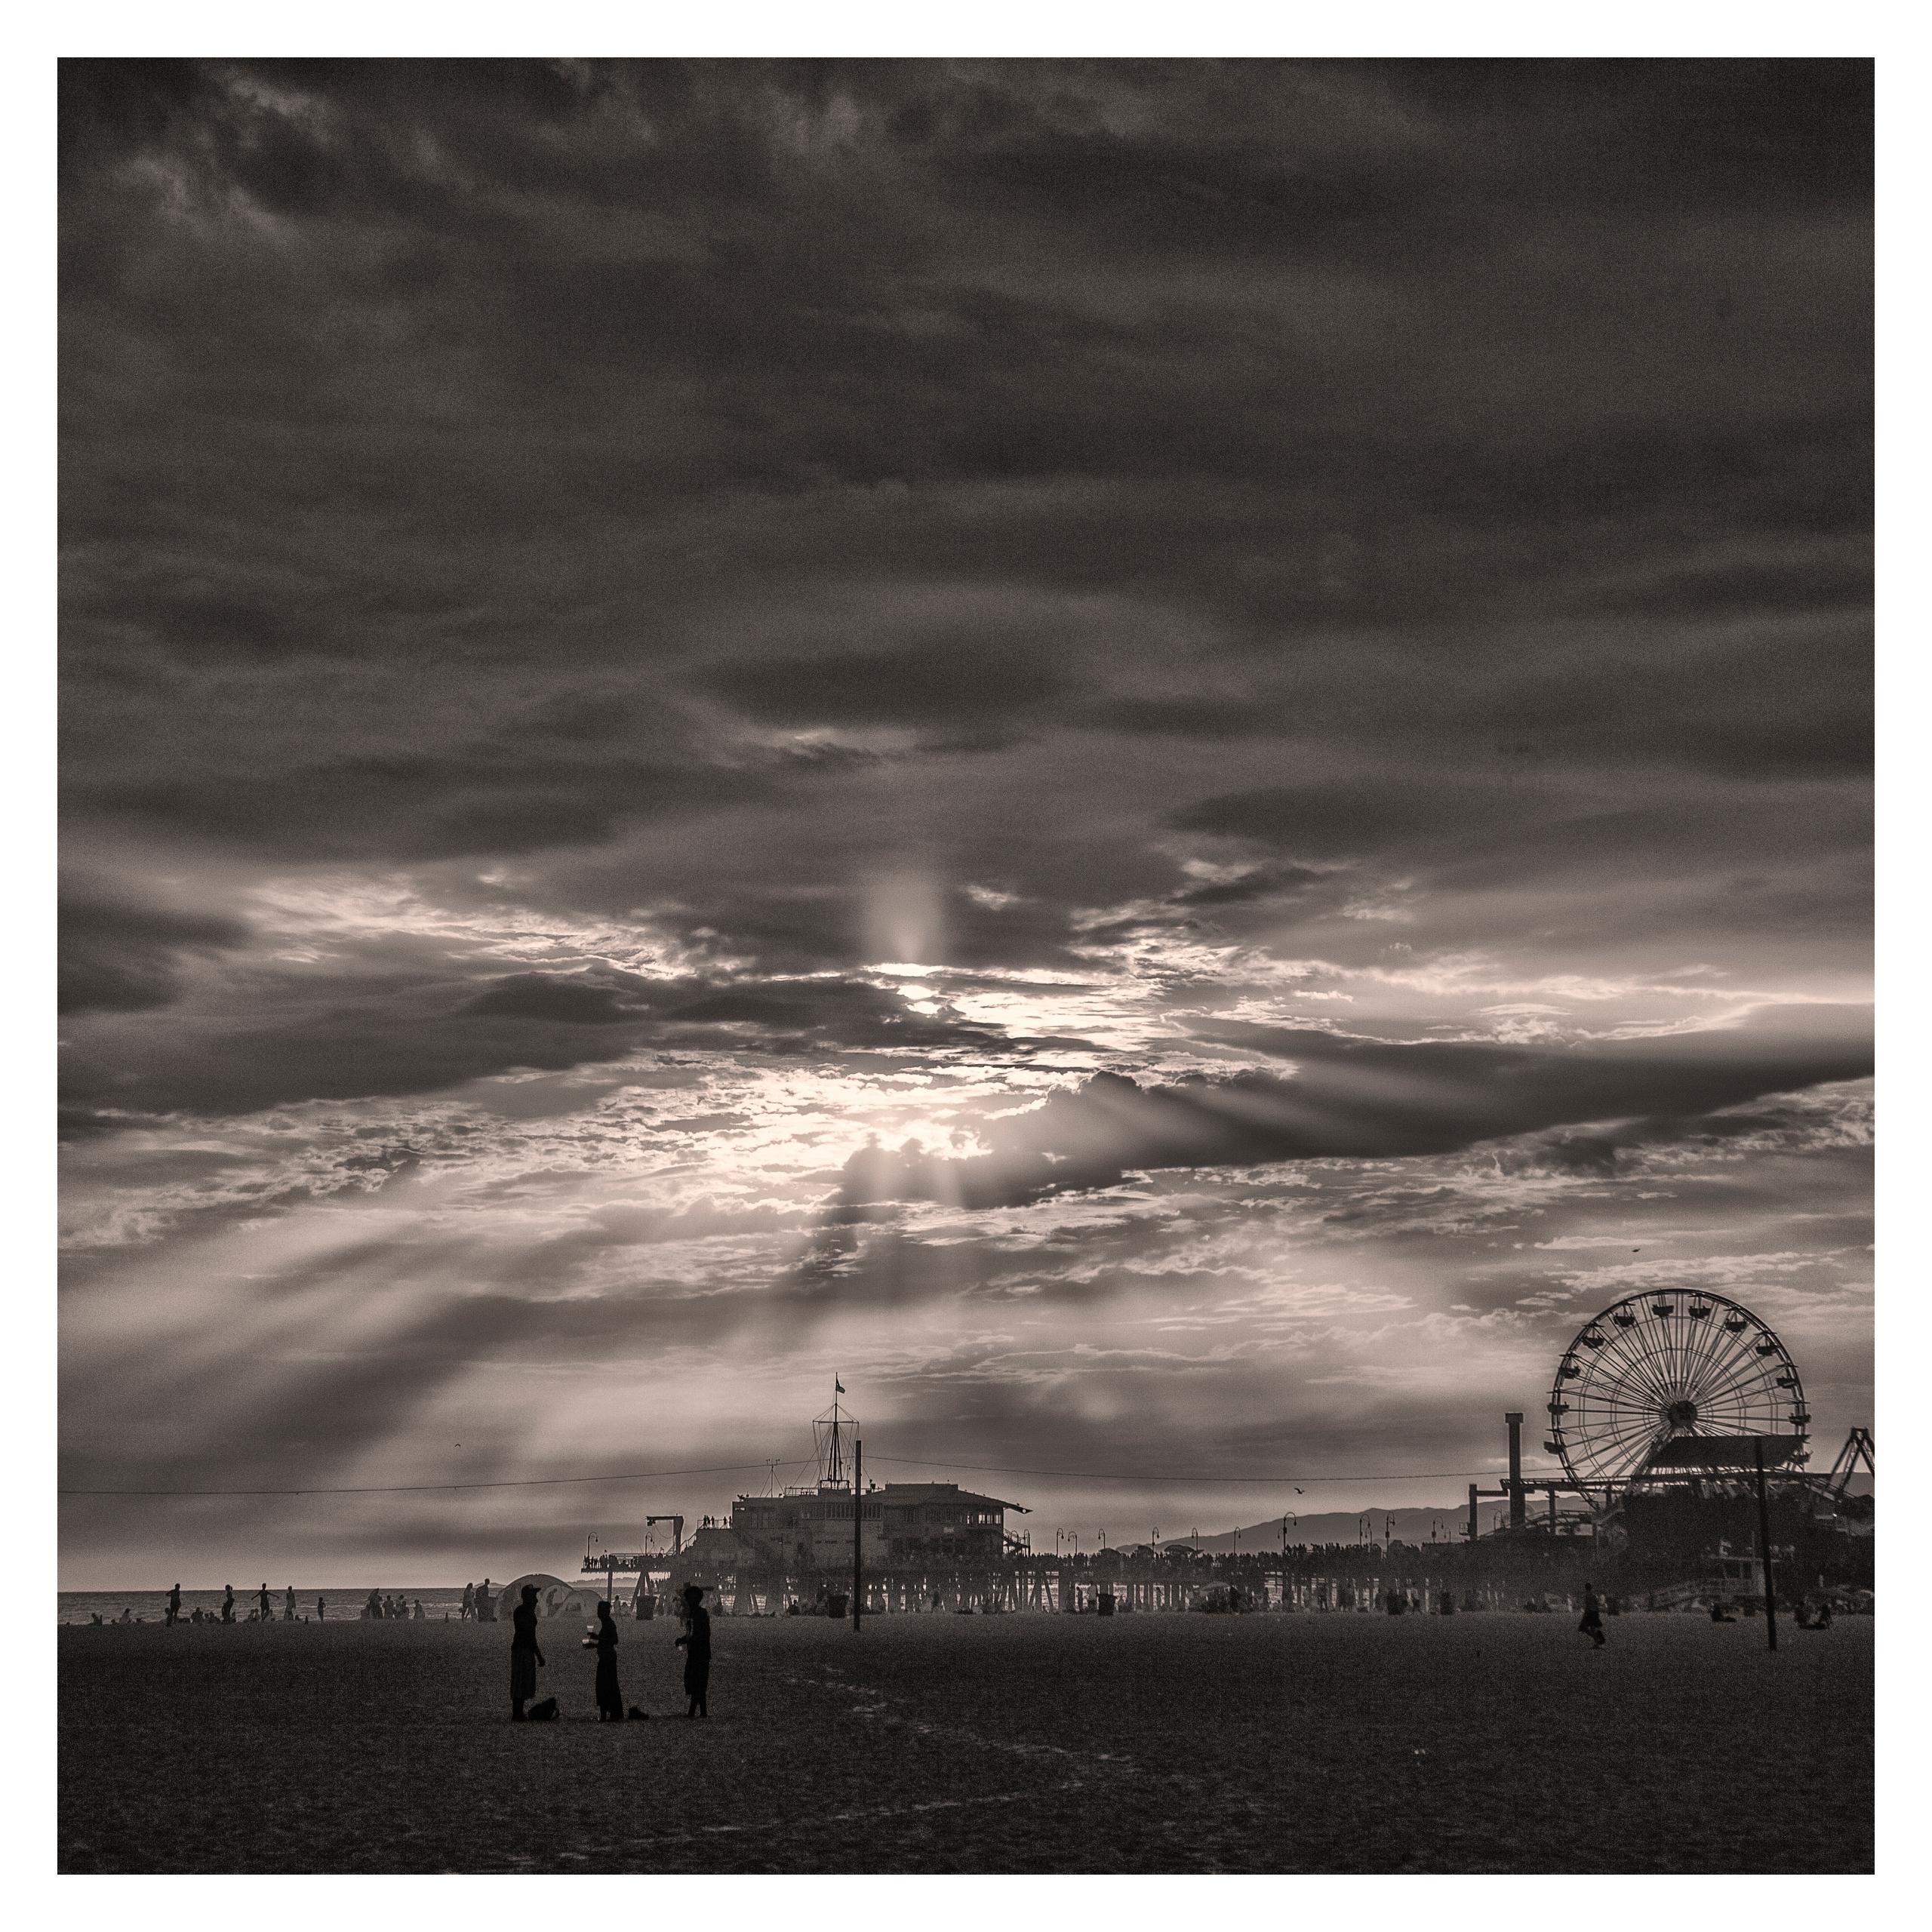 Sta. Mónica Pier Sunset, CA. US - guillermoalvarez | ello